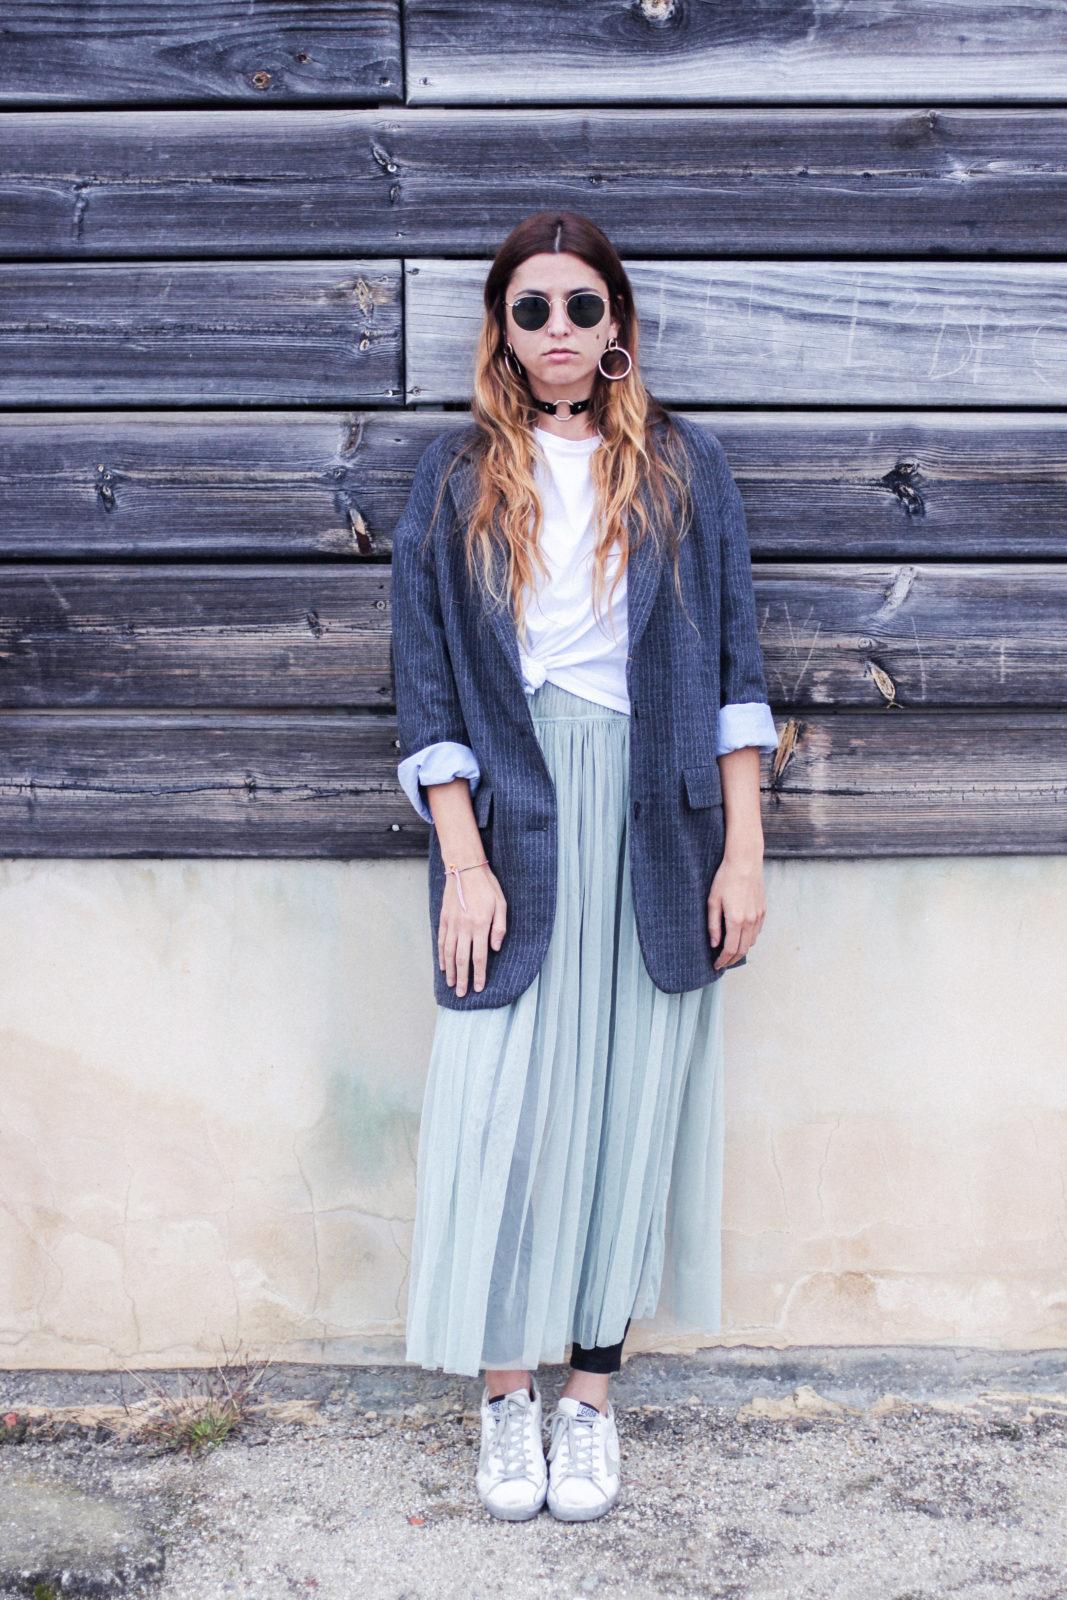 vestido_de_tul_sobre_pantalon_estilo_bailarina_blazer_oversize_pendientes_de_aros_choker_tendencias_trends_fall_2016_street_style_donkeycool-8